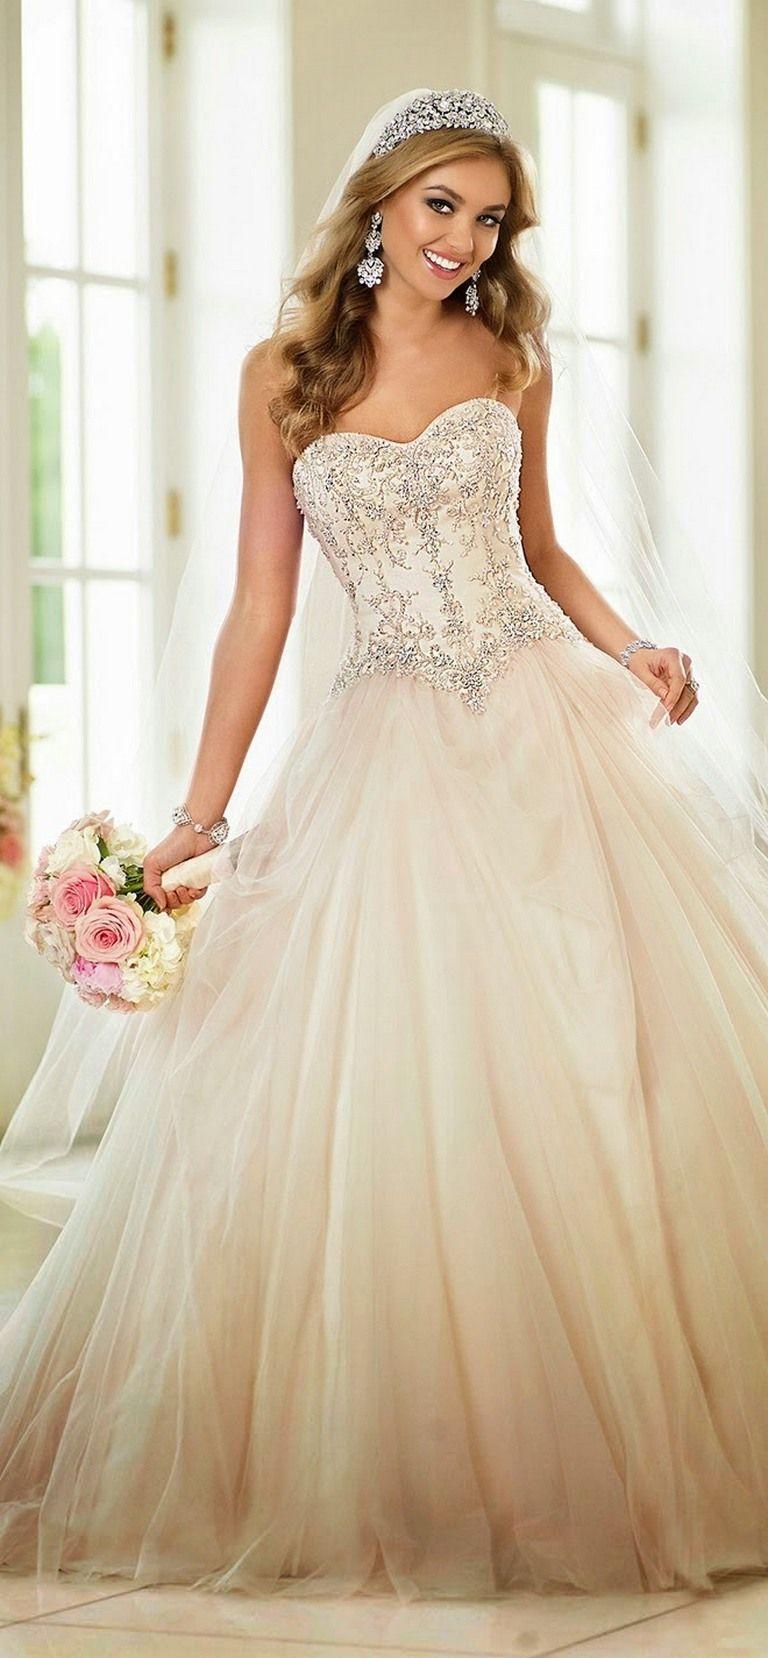 Wedding dress princess wedding dresses awesome ideas wedding